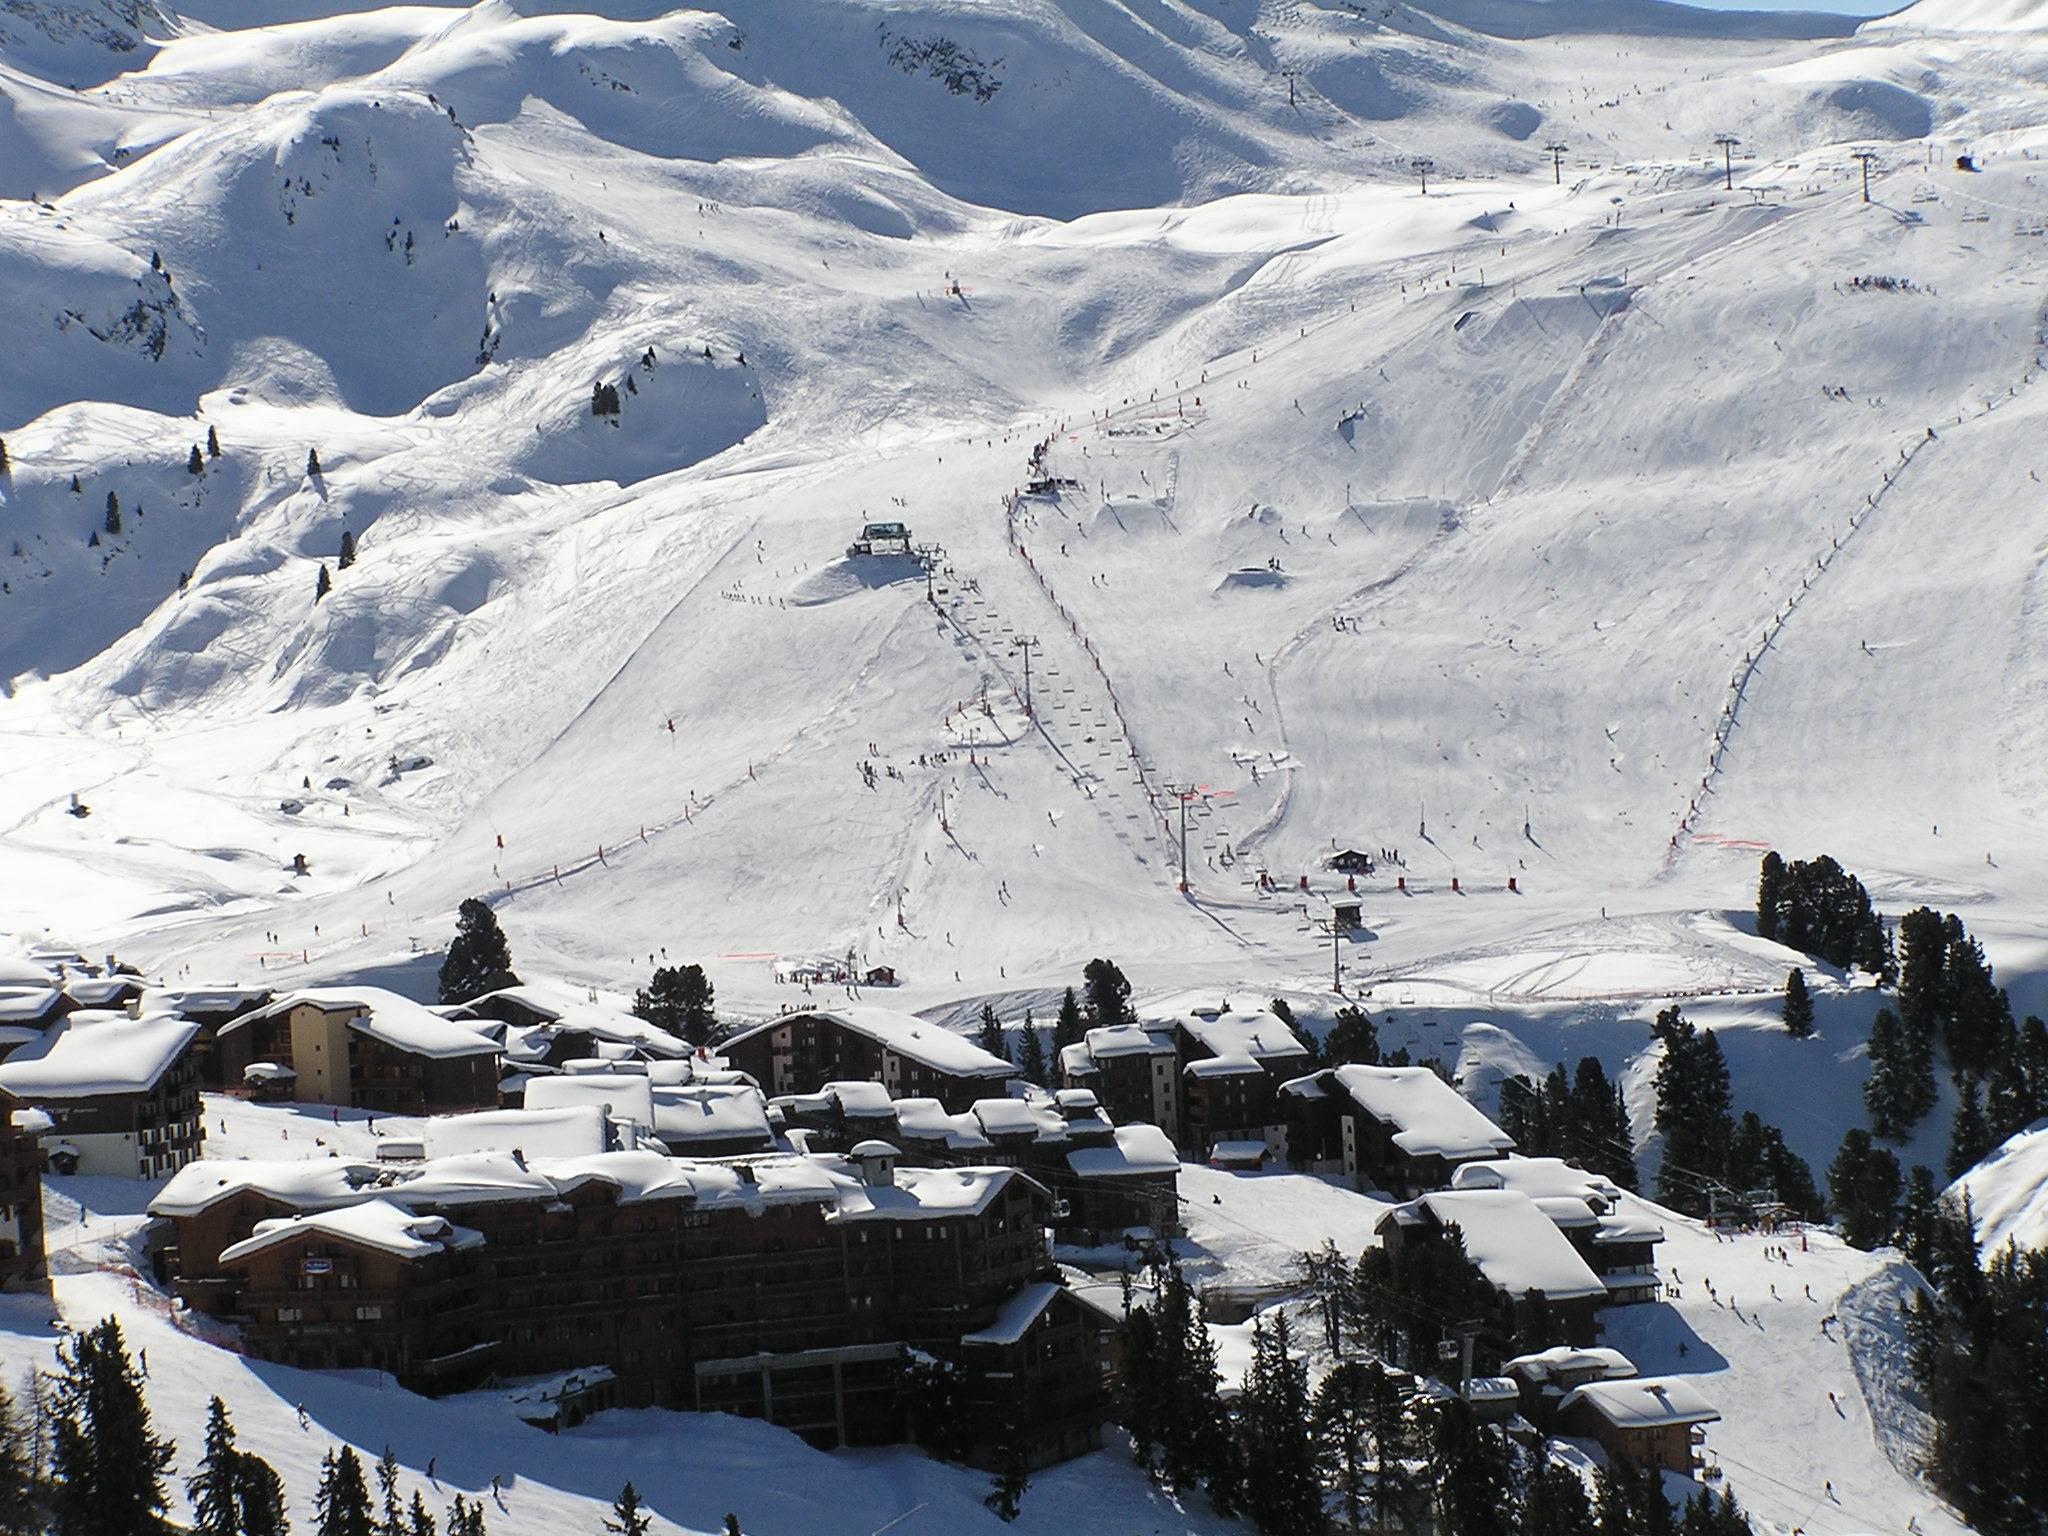 meilleures stations de ski familiales en france vacances au ski. Black Bedroom Furniture Sets. Home Design Ideas